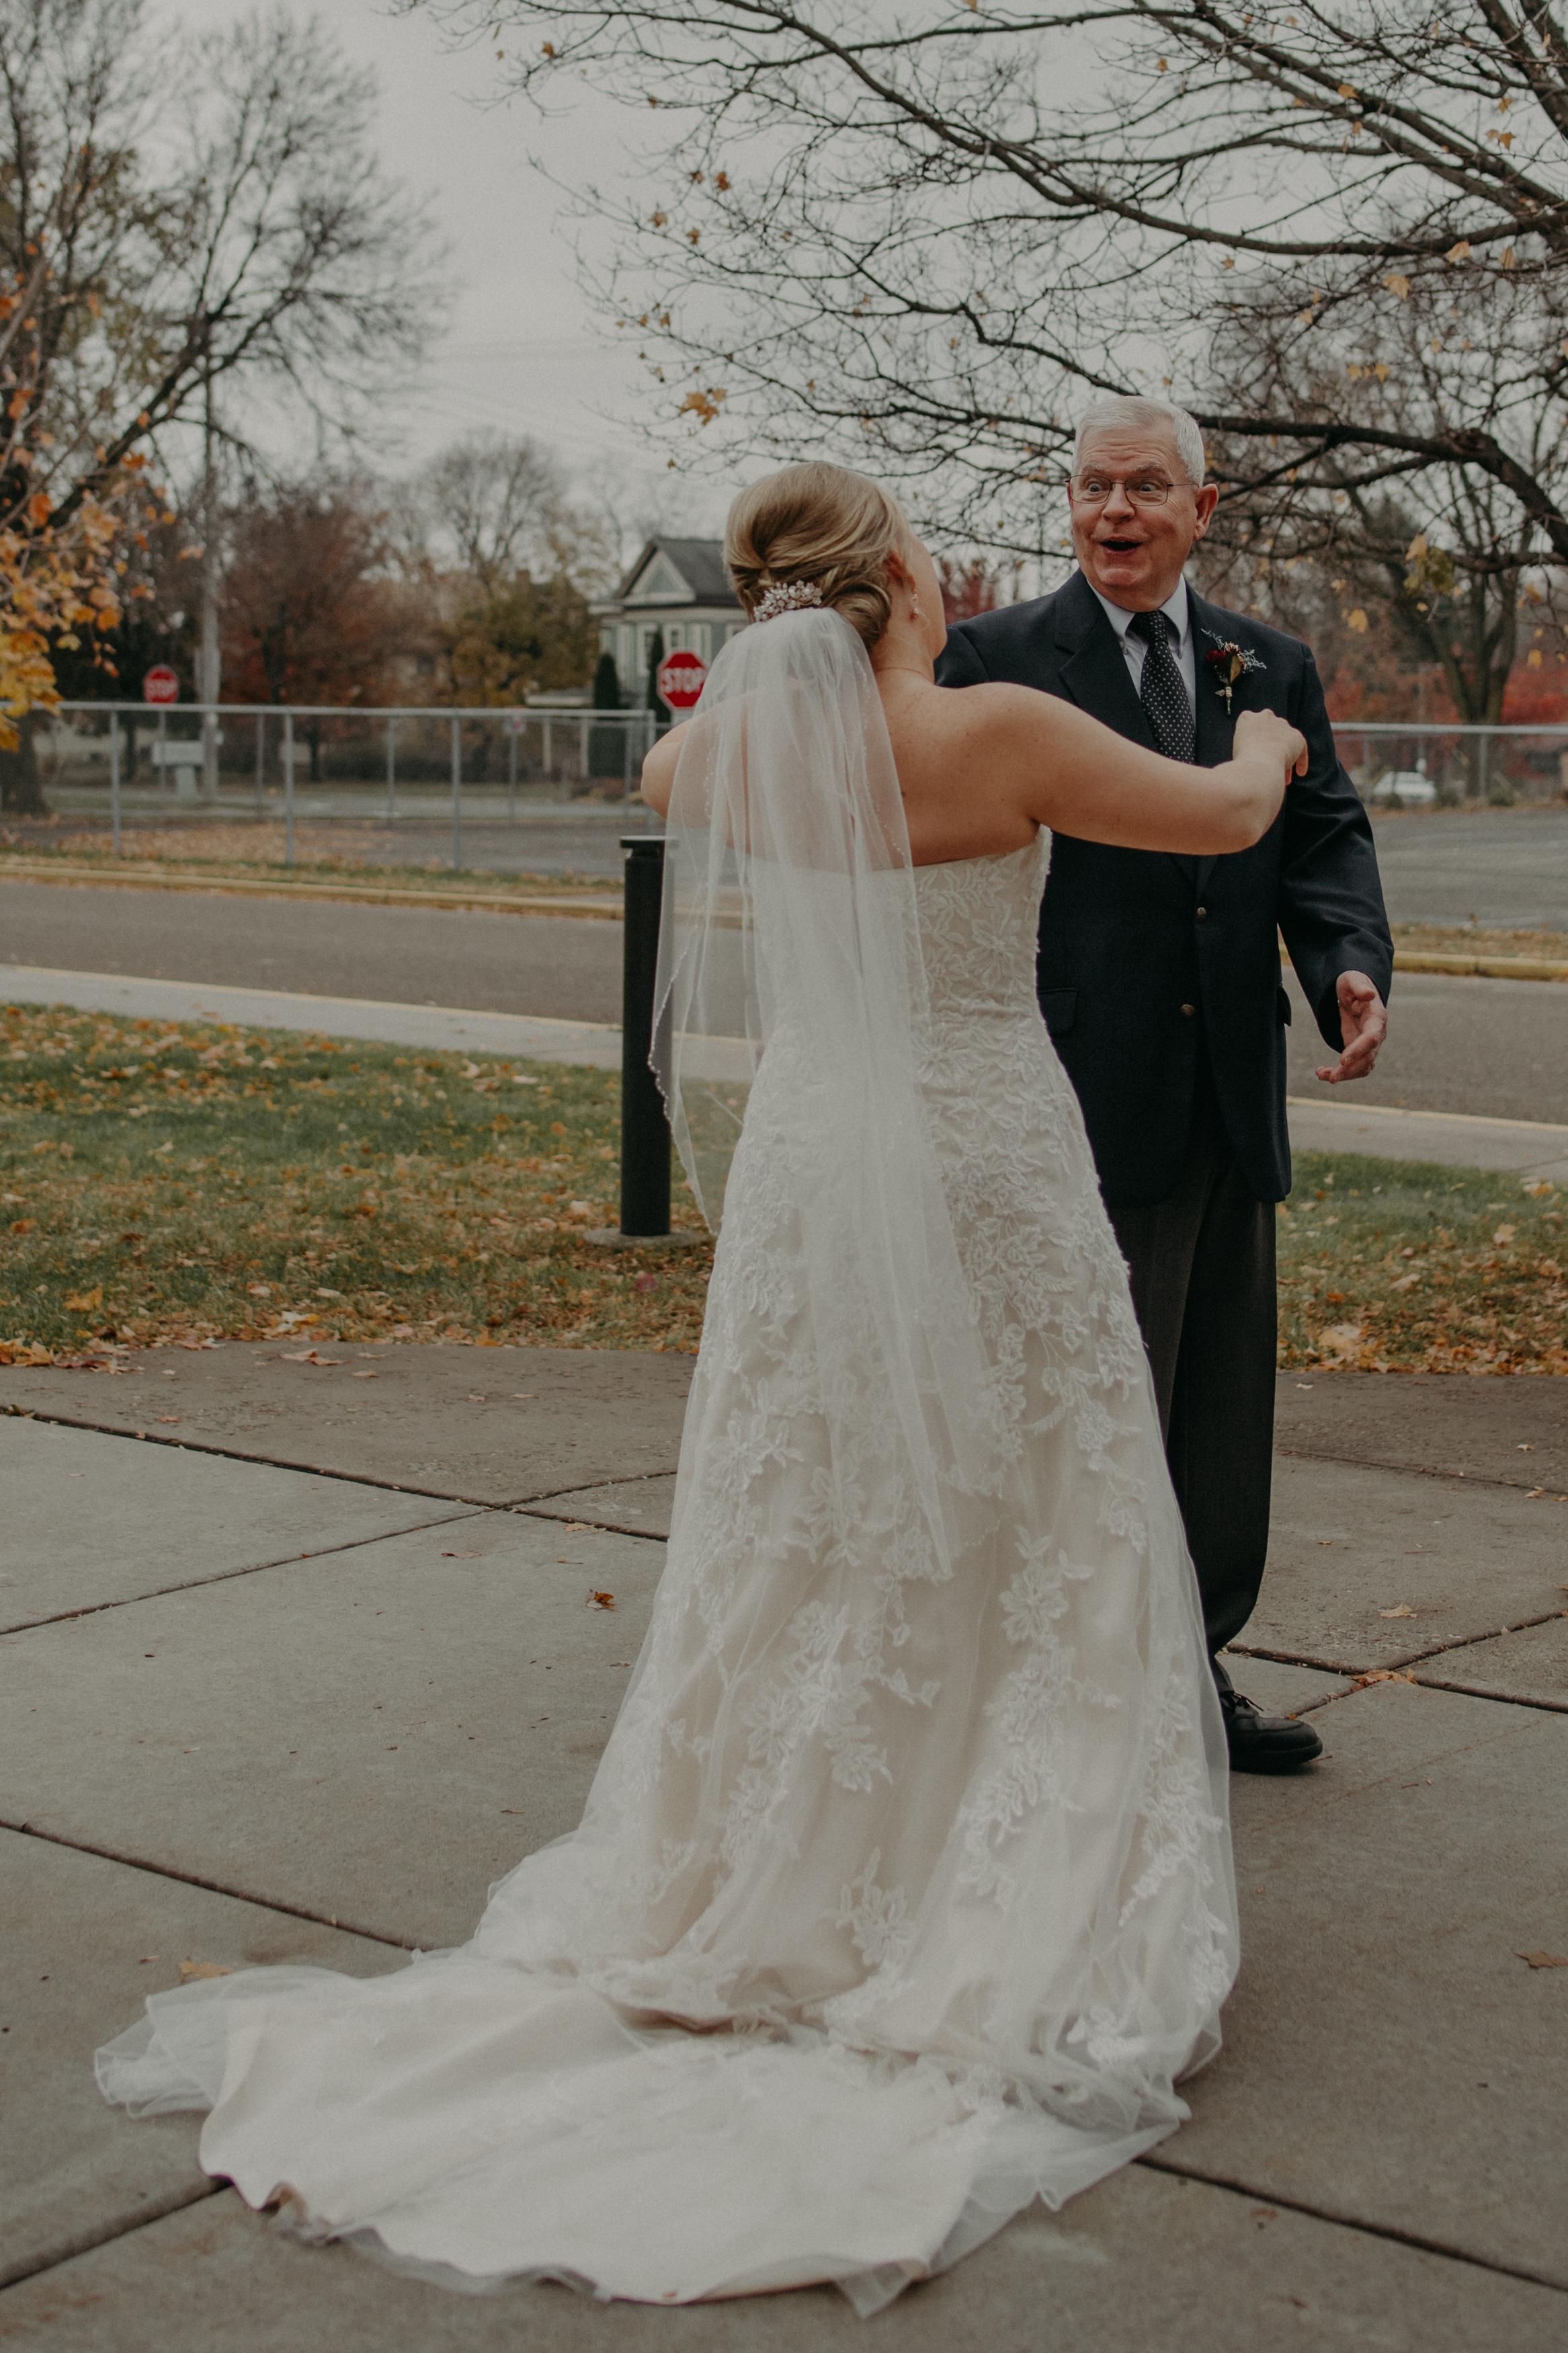 Weisenbeck_Wedding_Oct2018-117.jpg